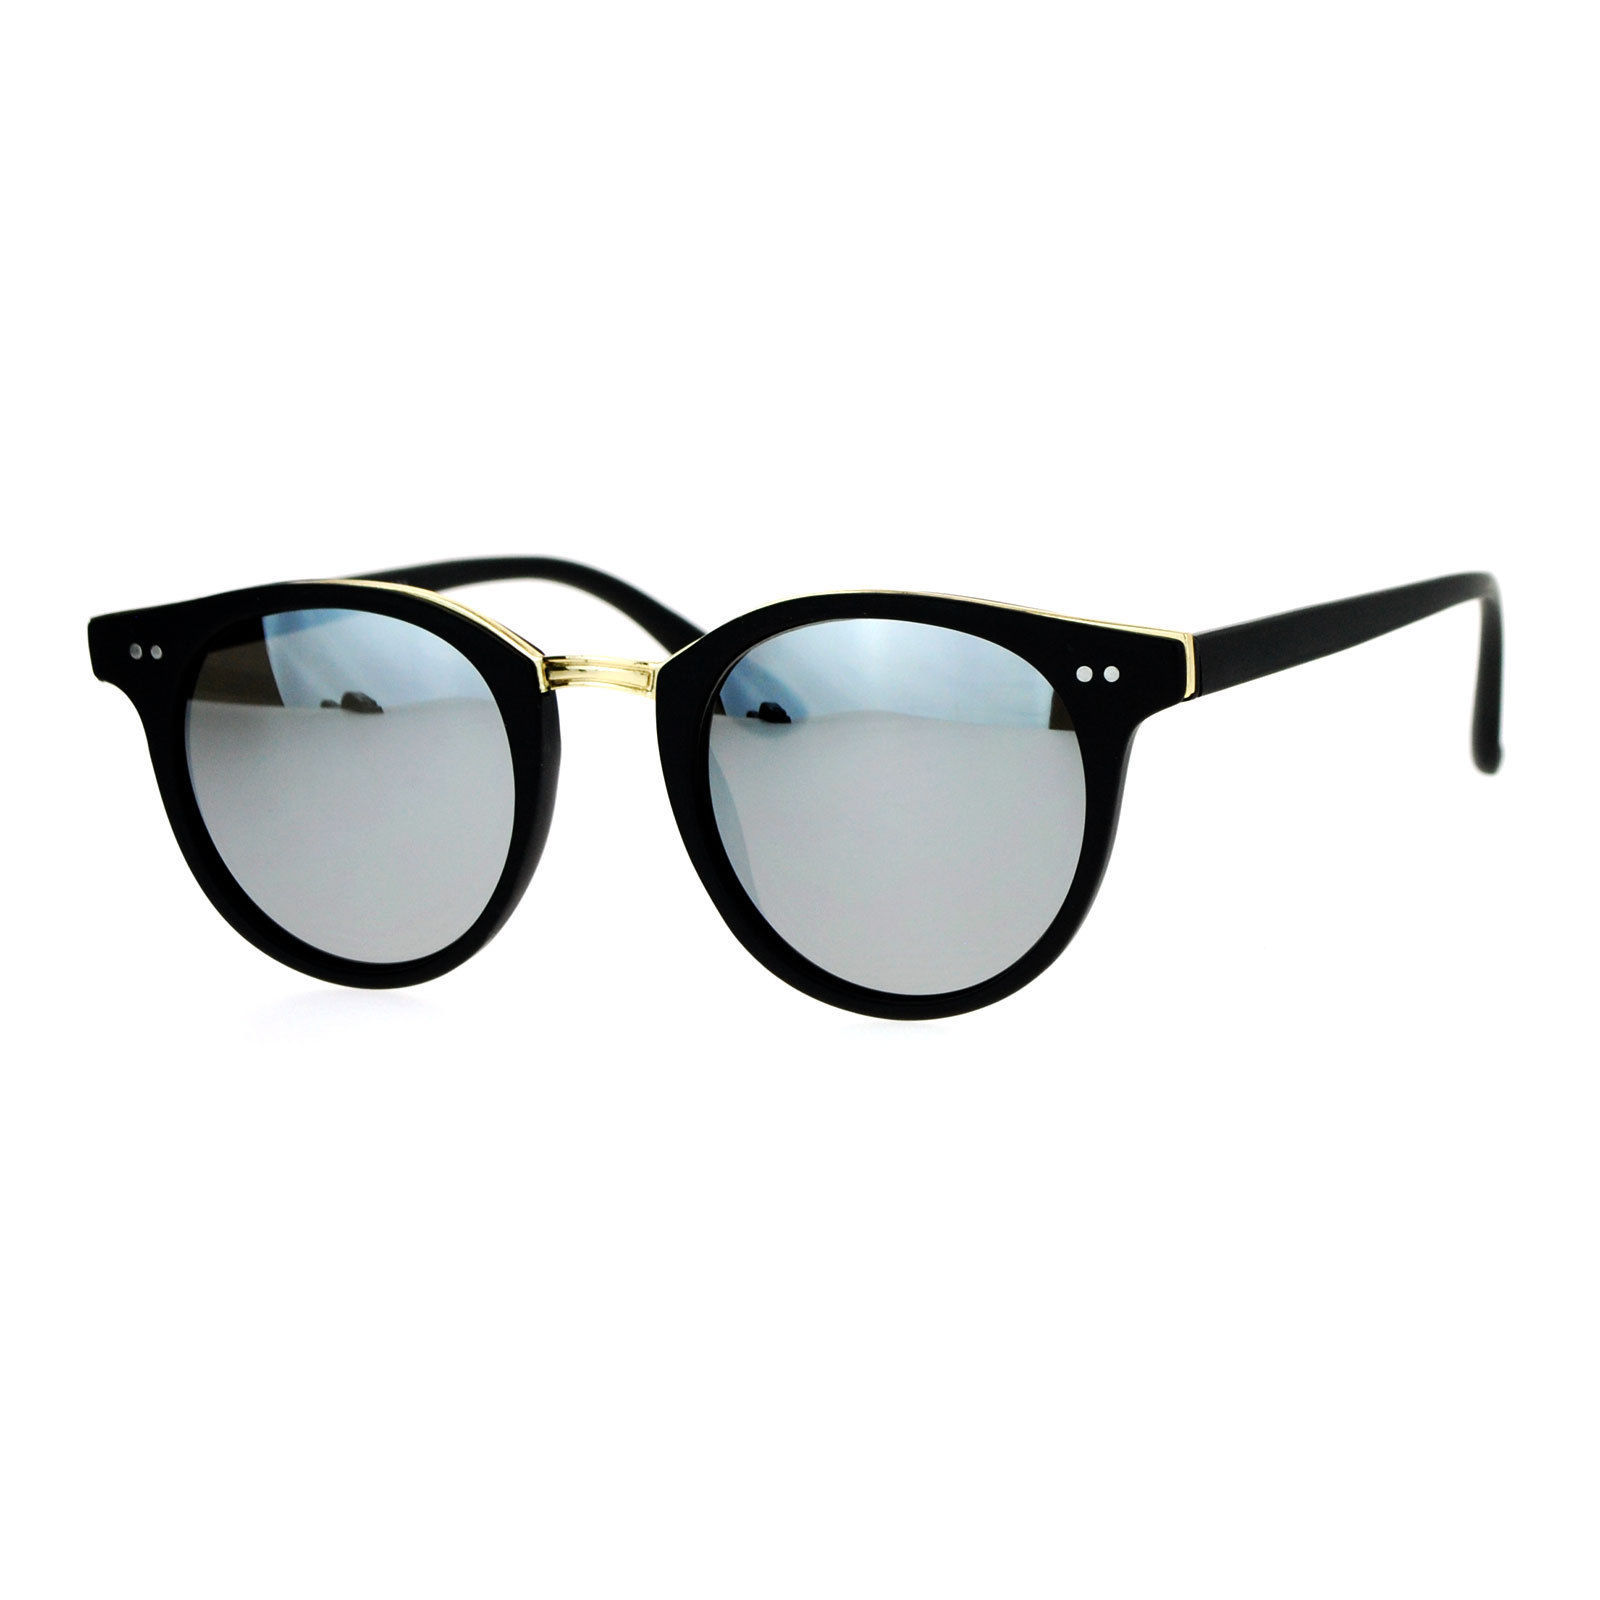 Vintage Retro Unisex Fashion Sunglasses Round Horn Rim Double Frame